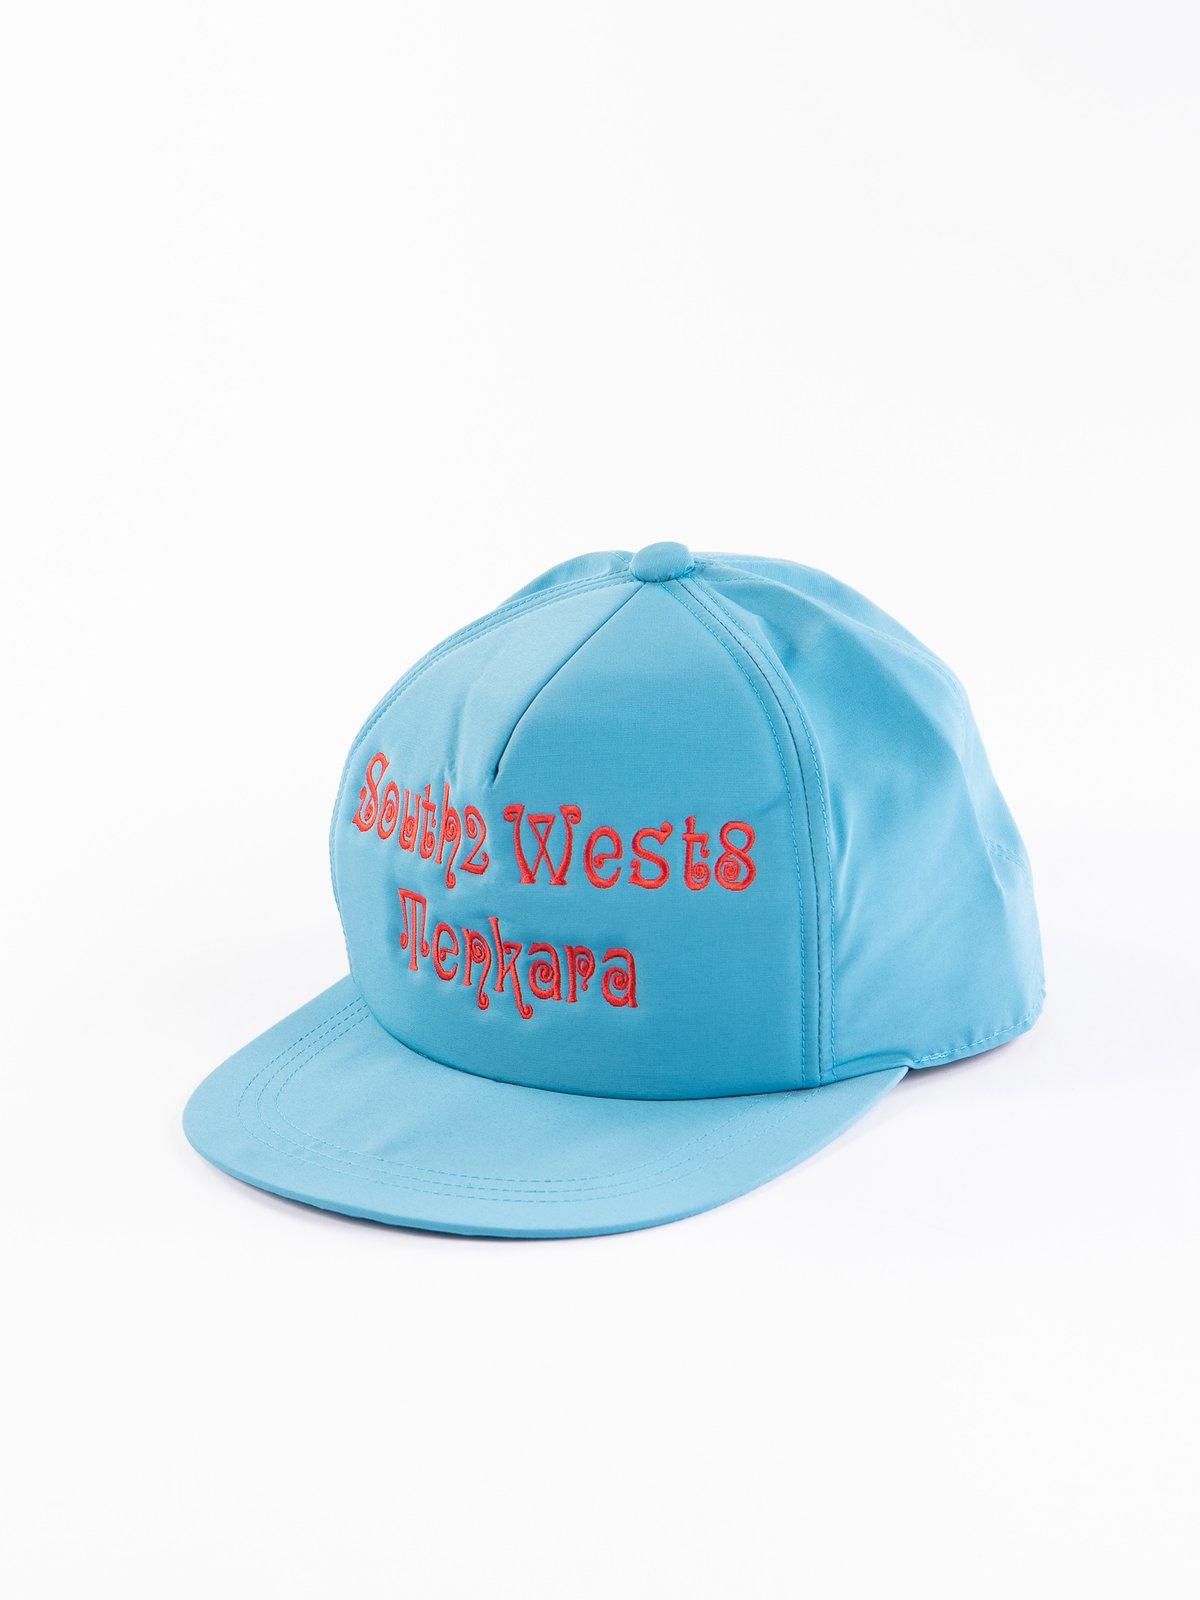 Turquoise Tenkara Embroidered Trucker Cap - Image 1